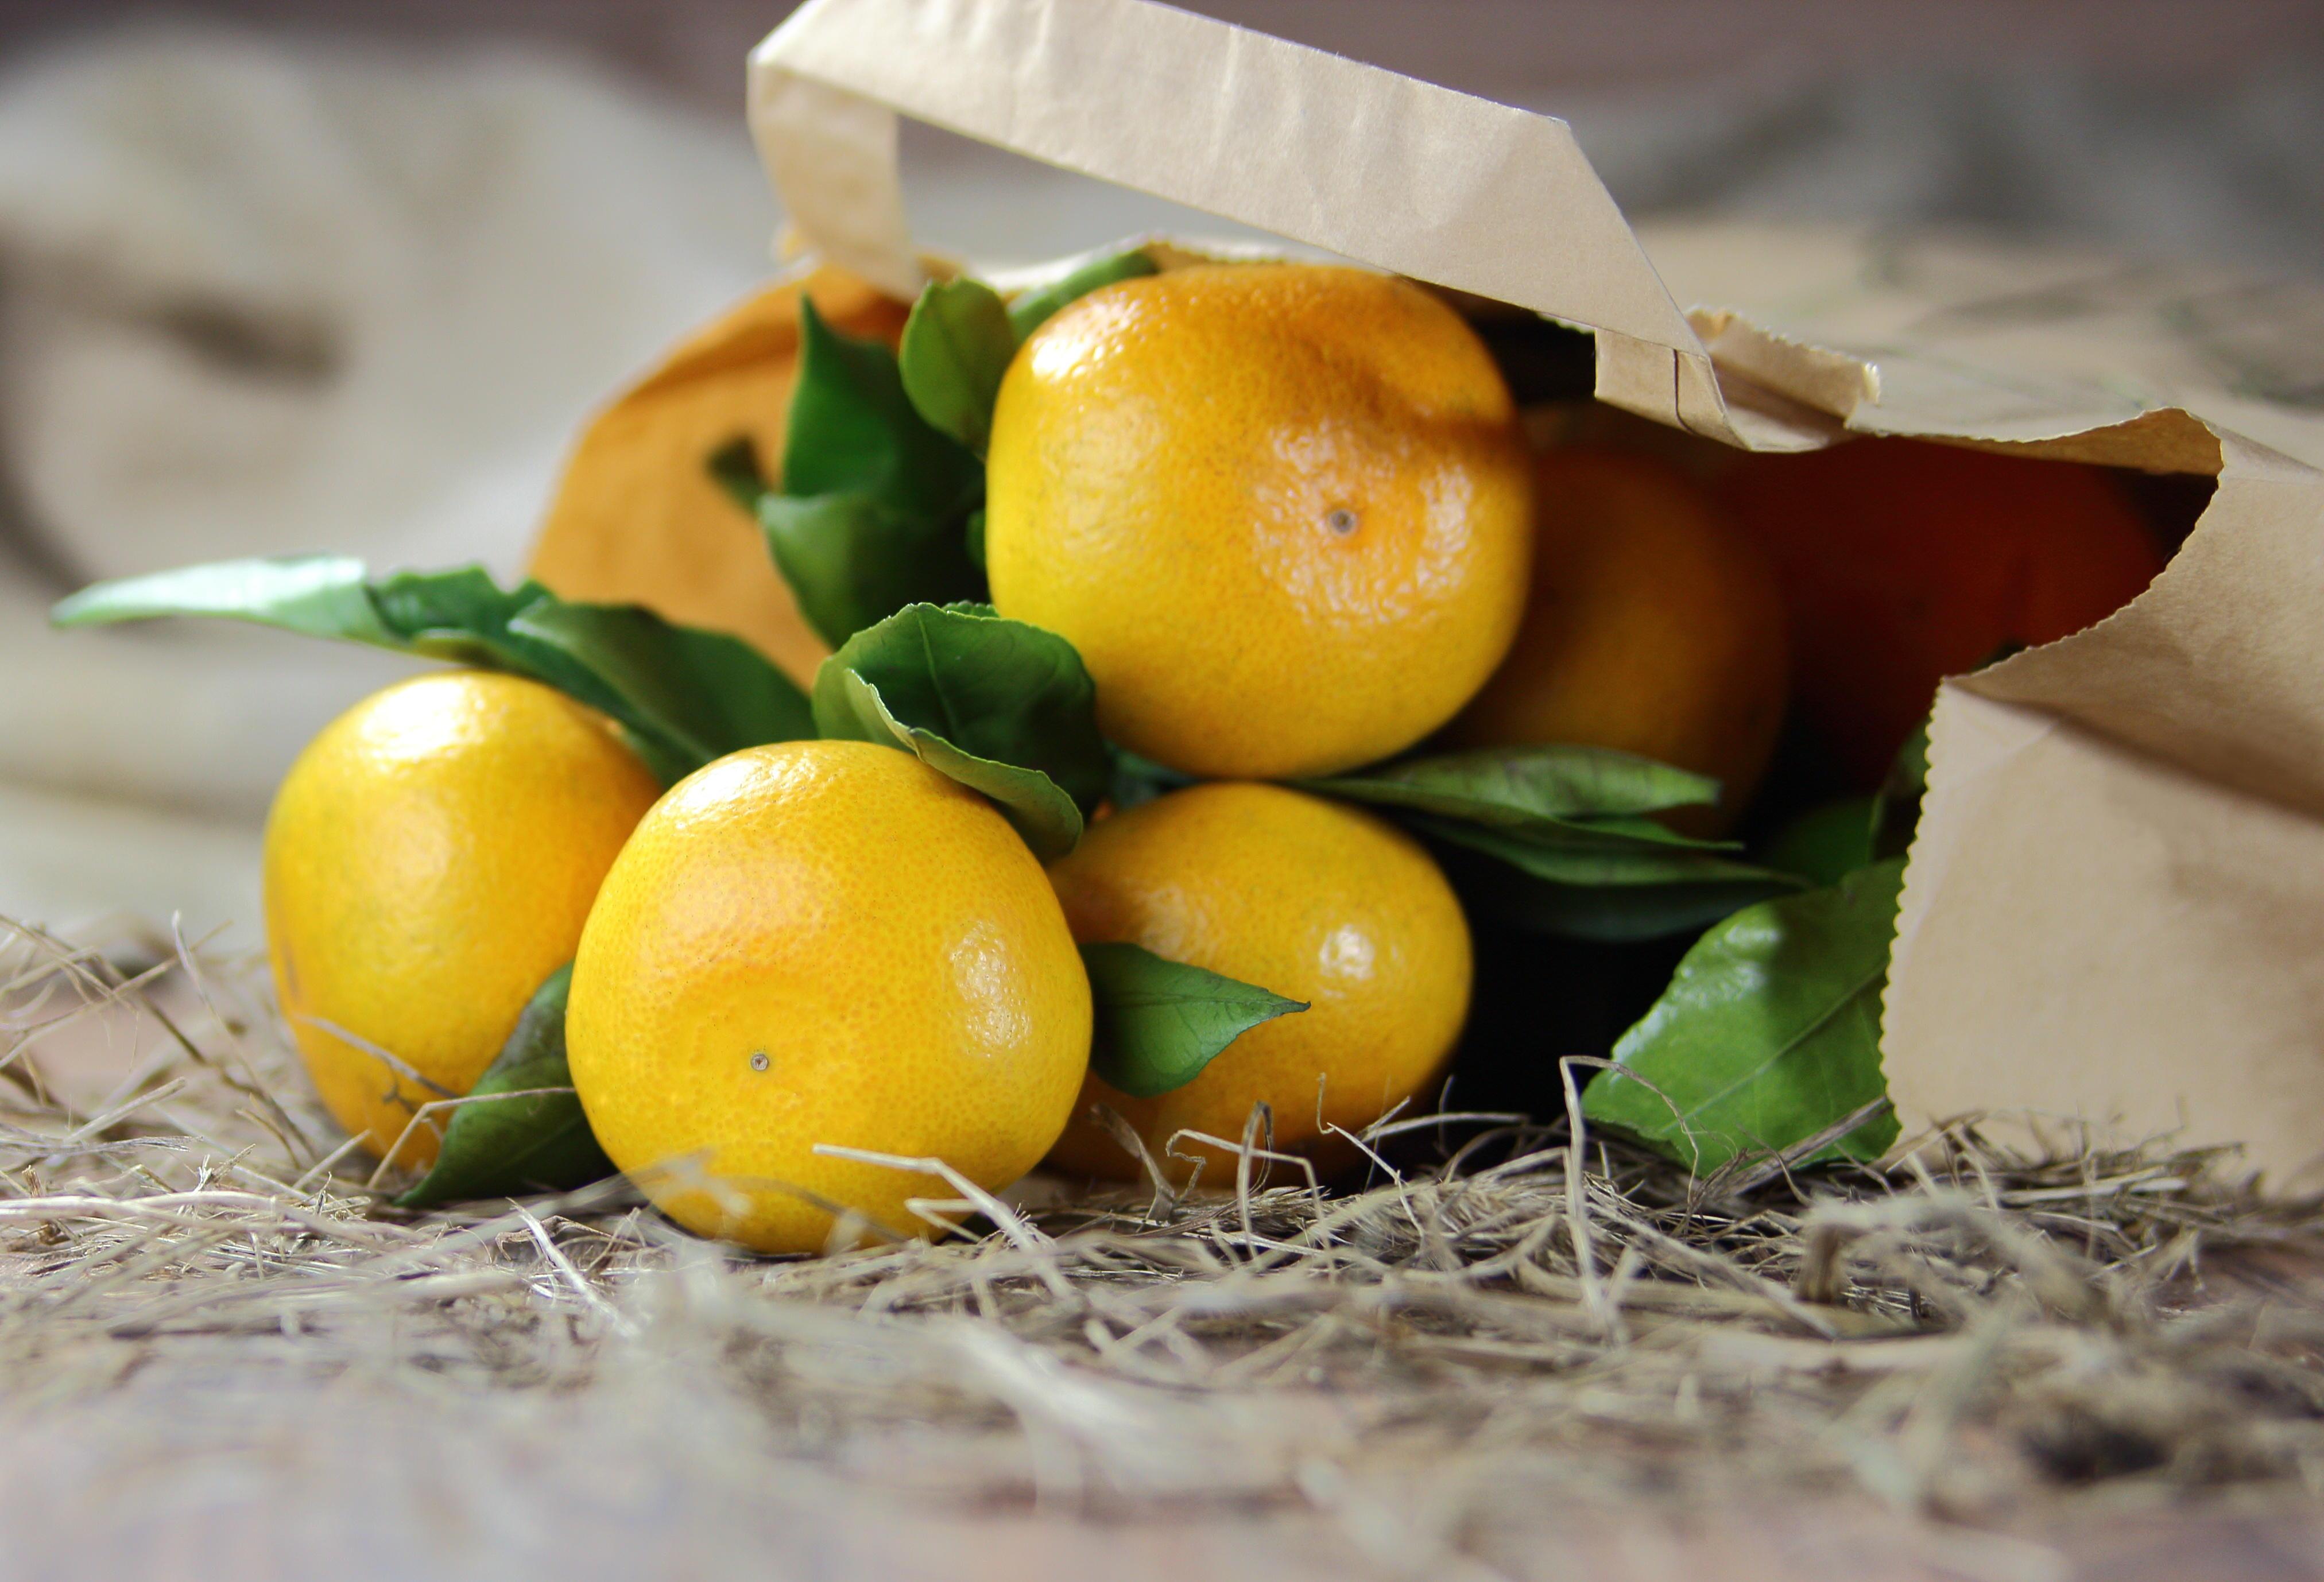 обои цитрусовые, мандарины, фрукты картинки фото